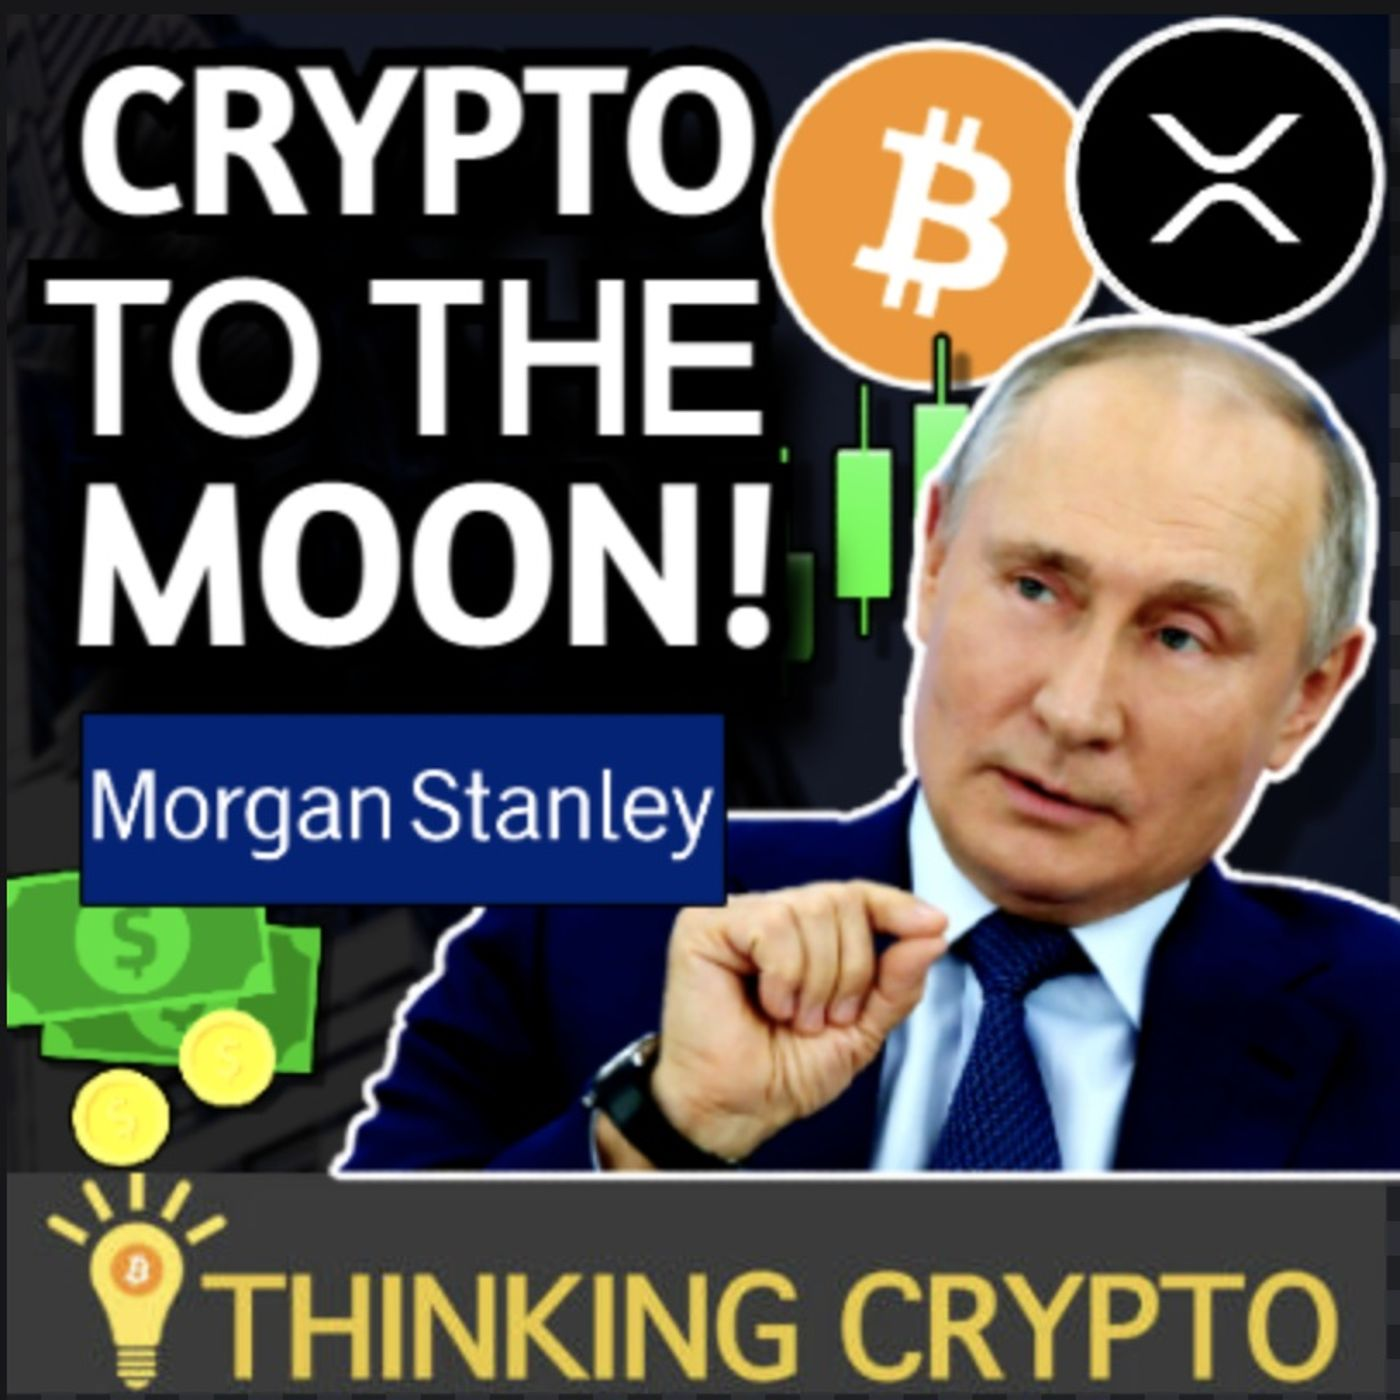 Morgan Stanley CEO & Putin Bullish on CRYPTO - Big Ripple XRP News - Bitcoin Miner IPO & NYSE ETF